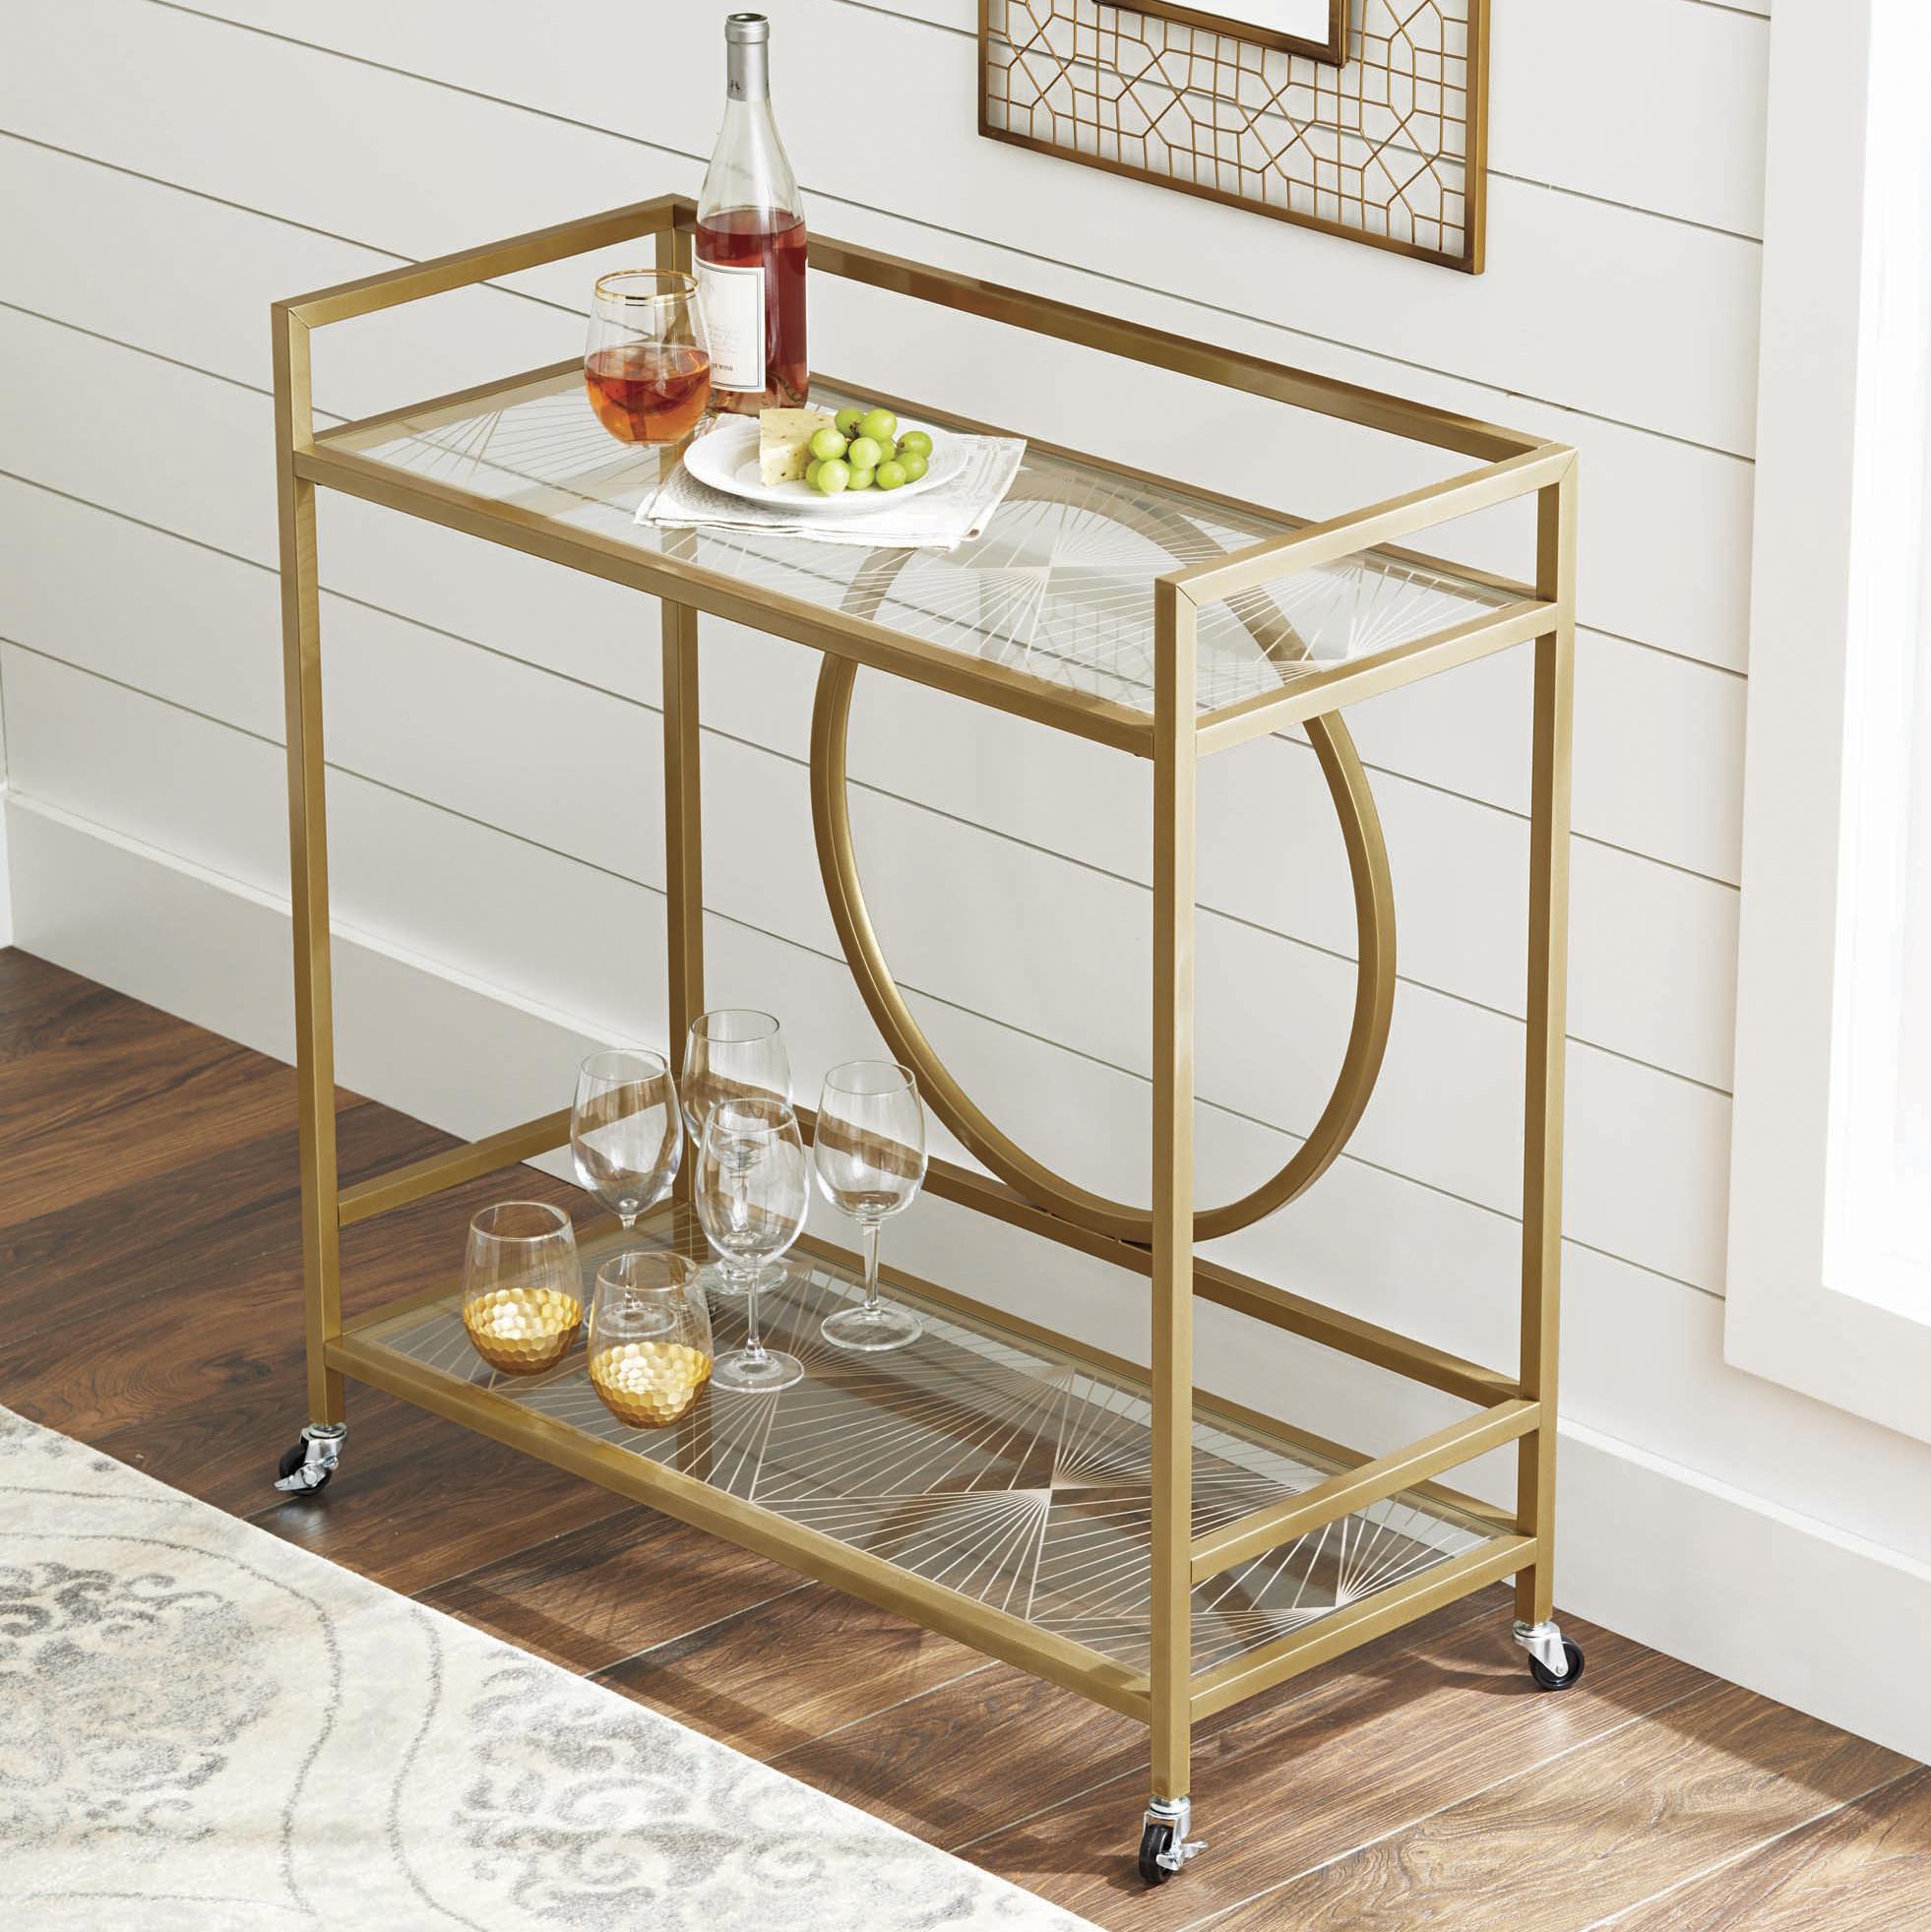 Better Homes & Gardens Nola Mid-Century Bar Cart, Gold Finish